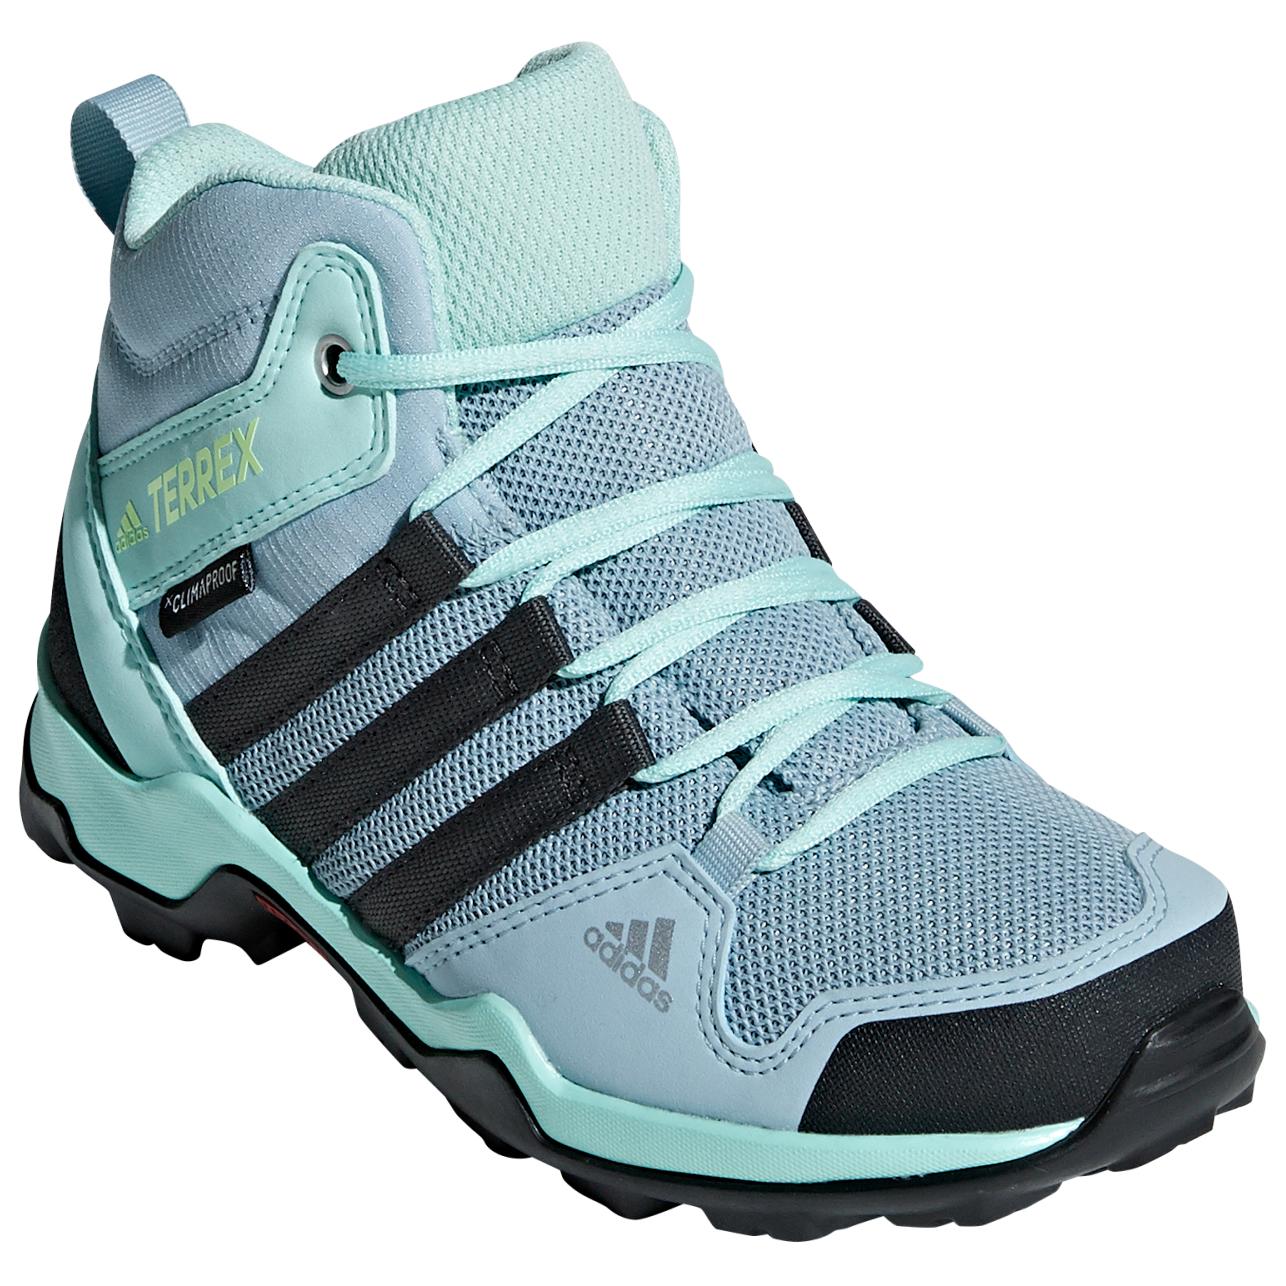 adidas Kid's Terrex AX2R Mid CP Chaussures de randonnée Ash Grey Carbon Clear Mint | 28 (EU)